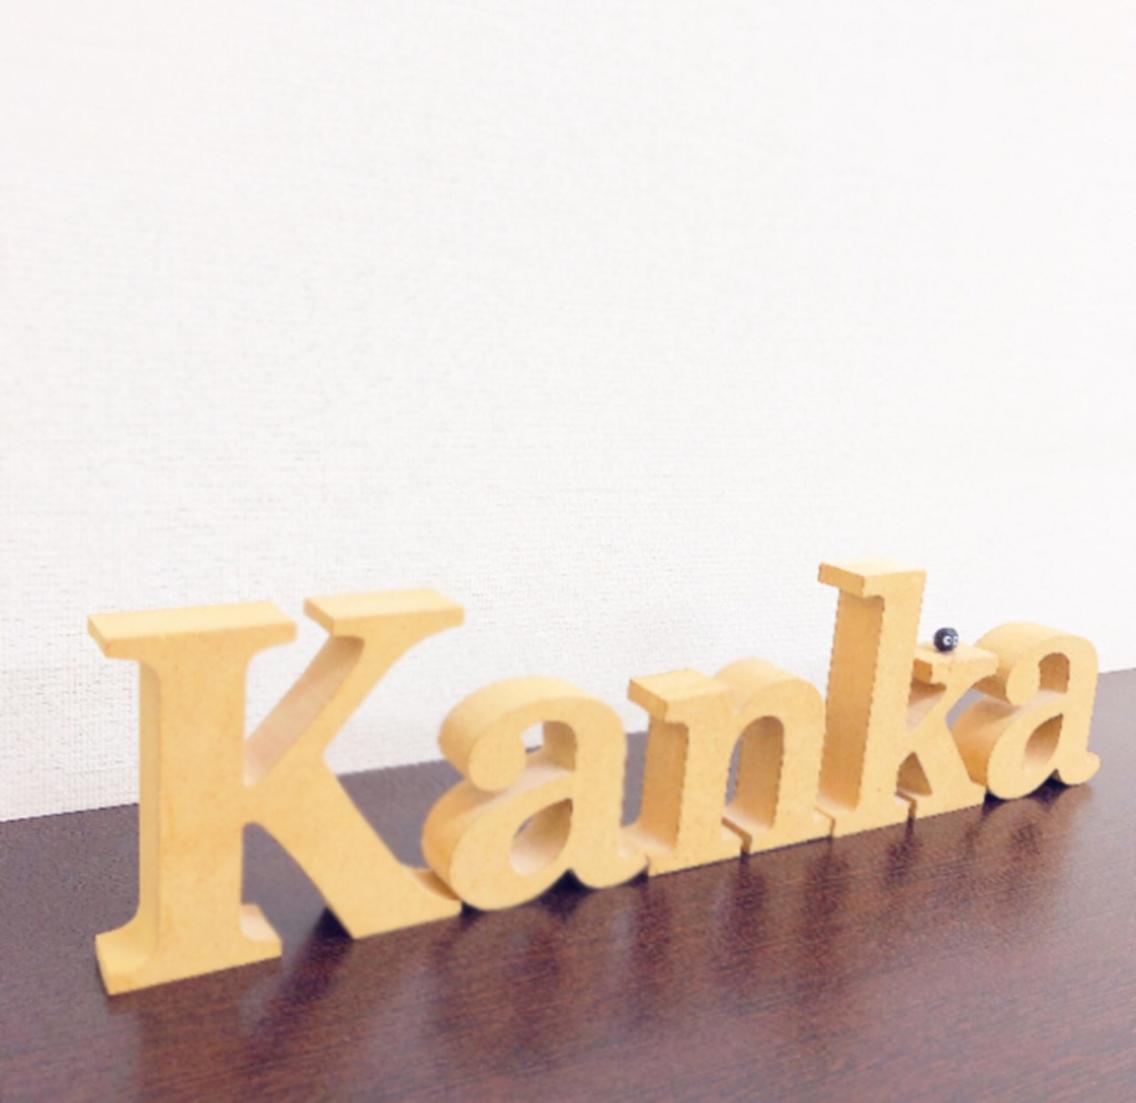 kanka新潟店所属・kanka新潟店宮野の掲載